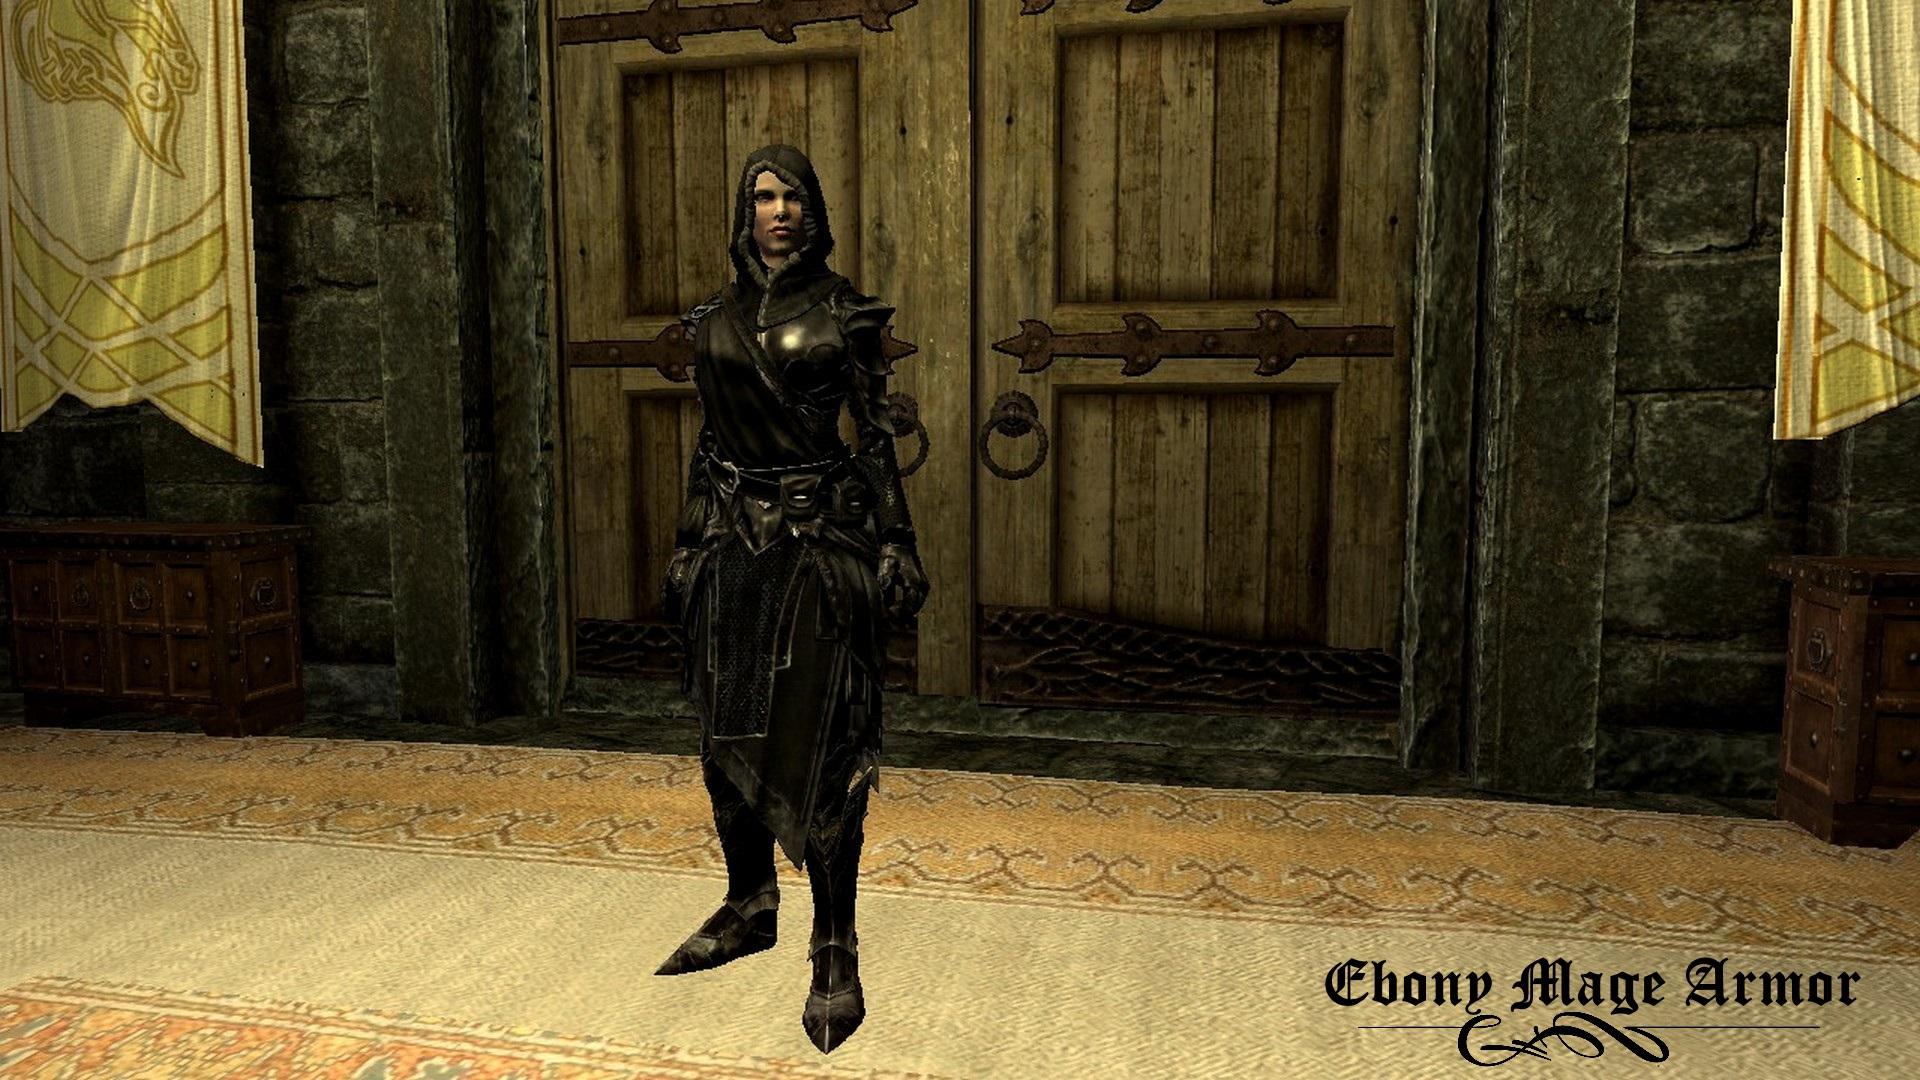 Ebony_Mage_Armor.jpg